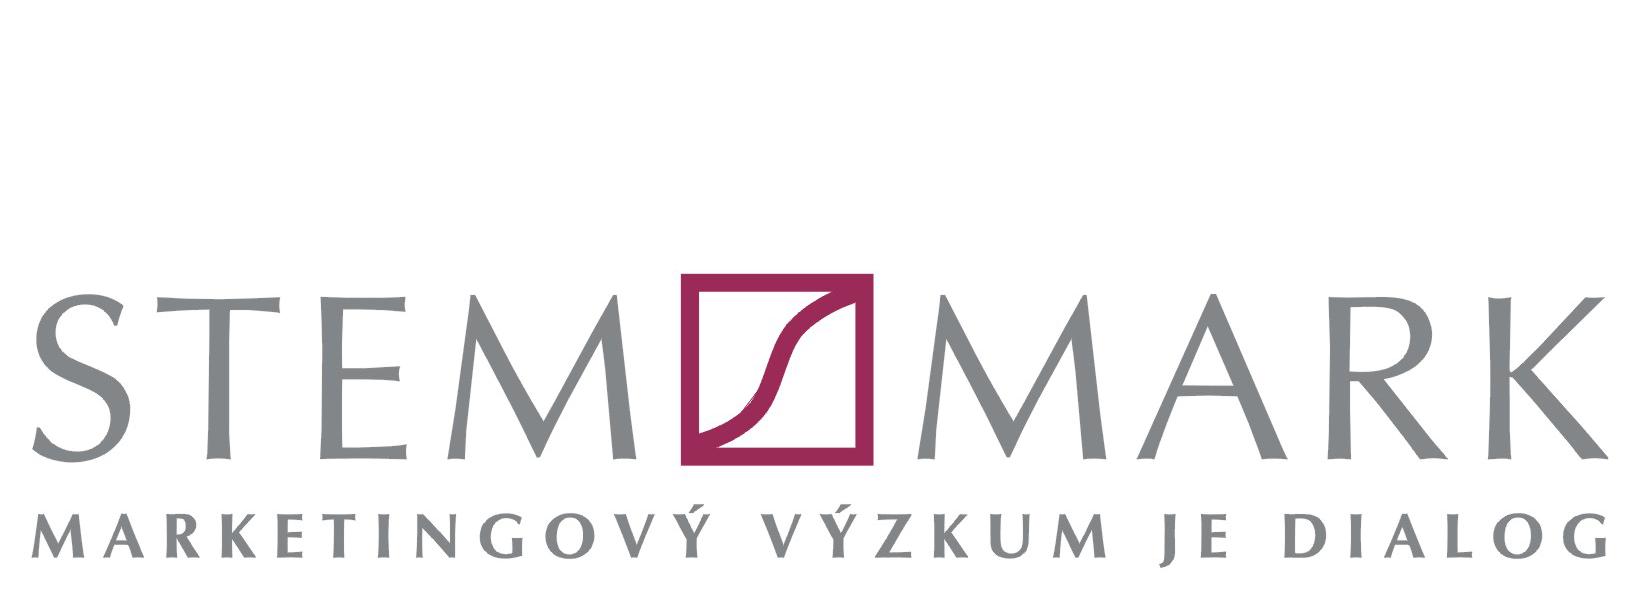 Stemmark